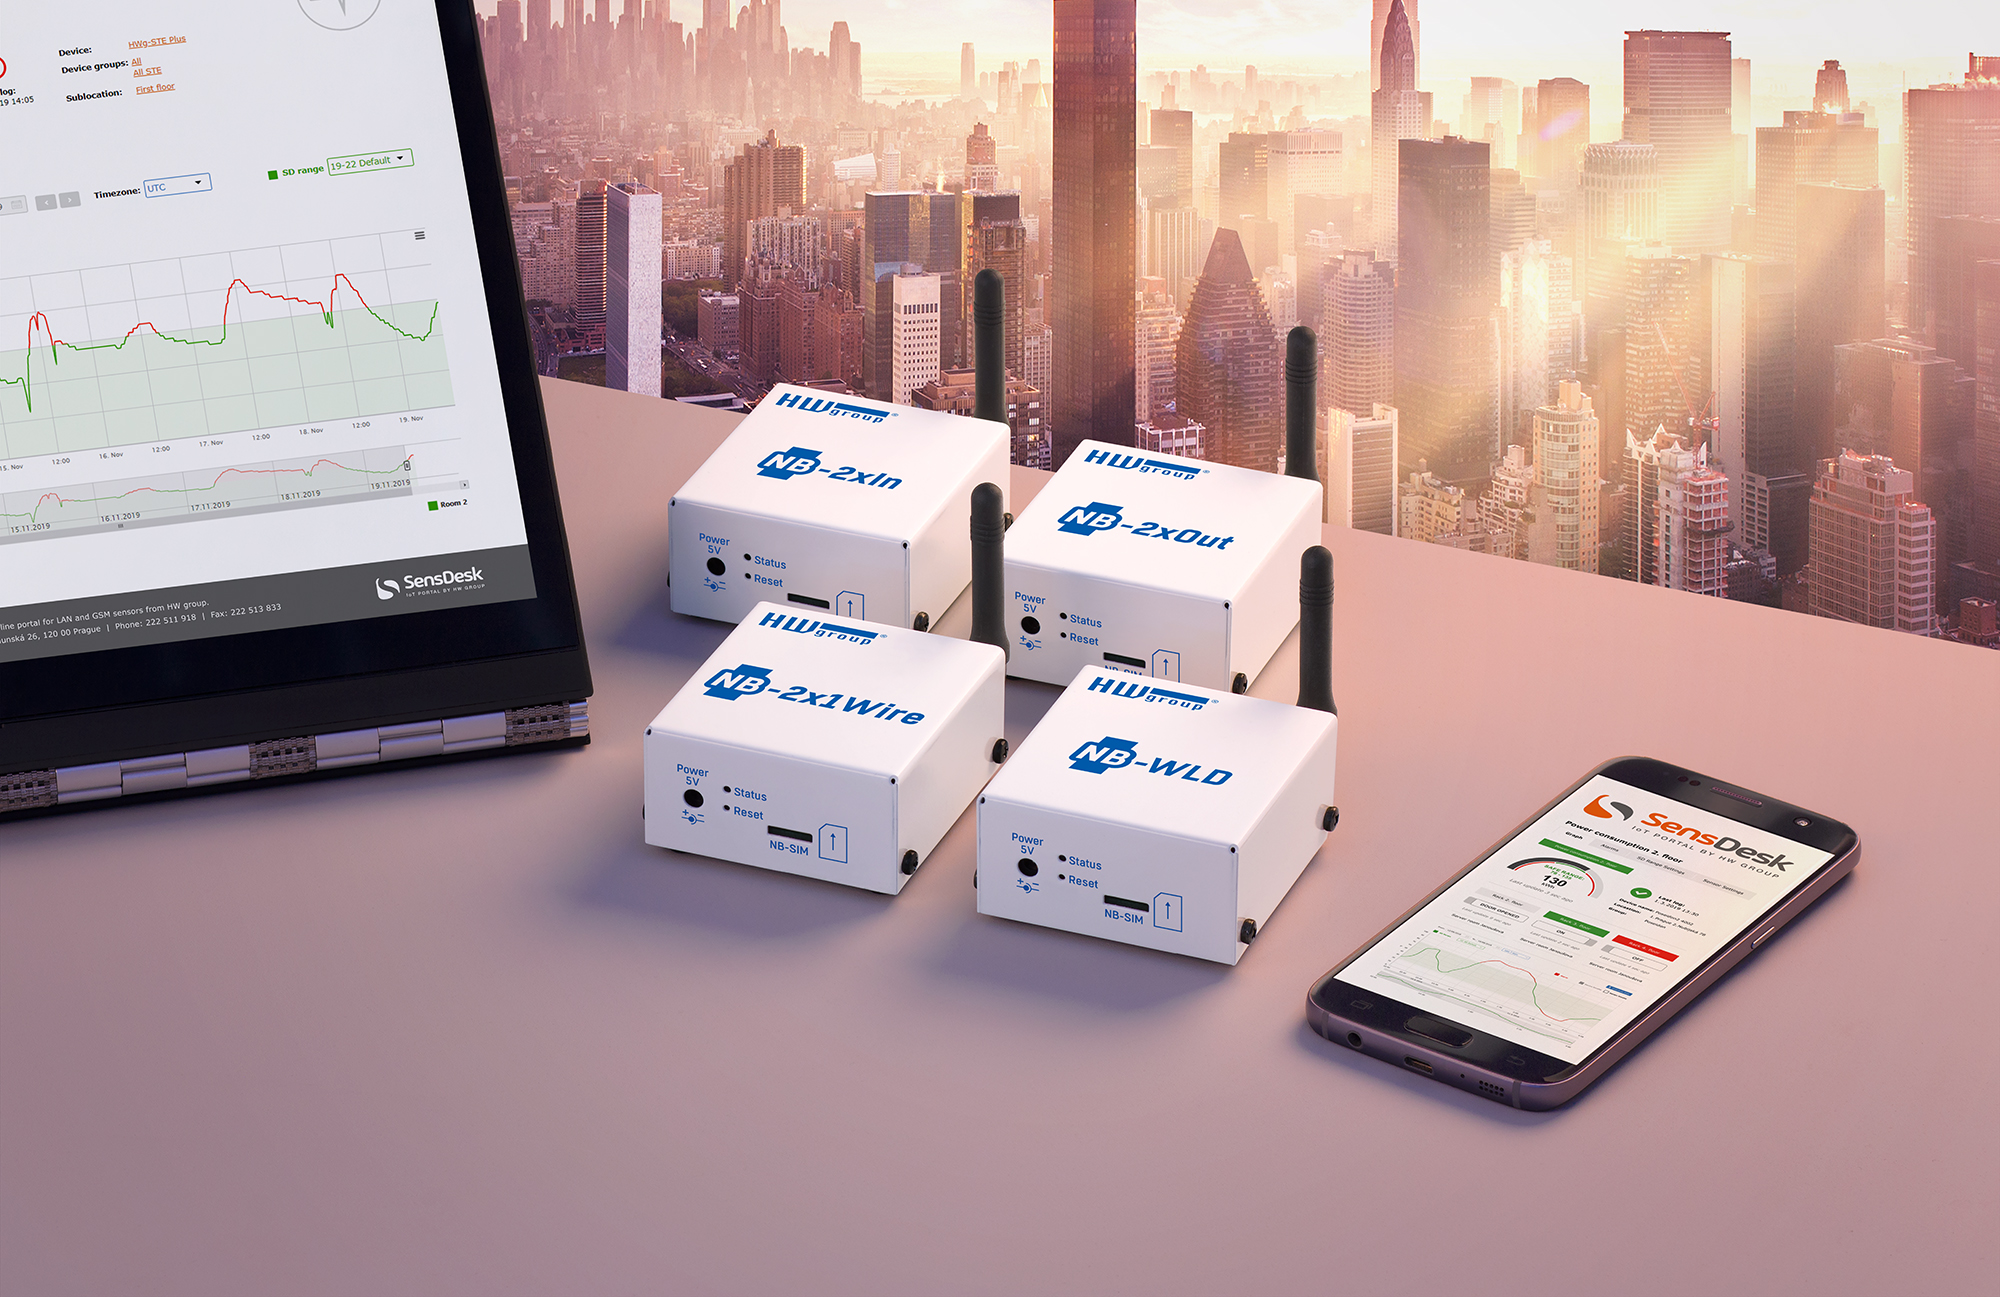 HWg NB 2x Out SensDesk Gateway incl NB-IoT SIM | Producten | MCS